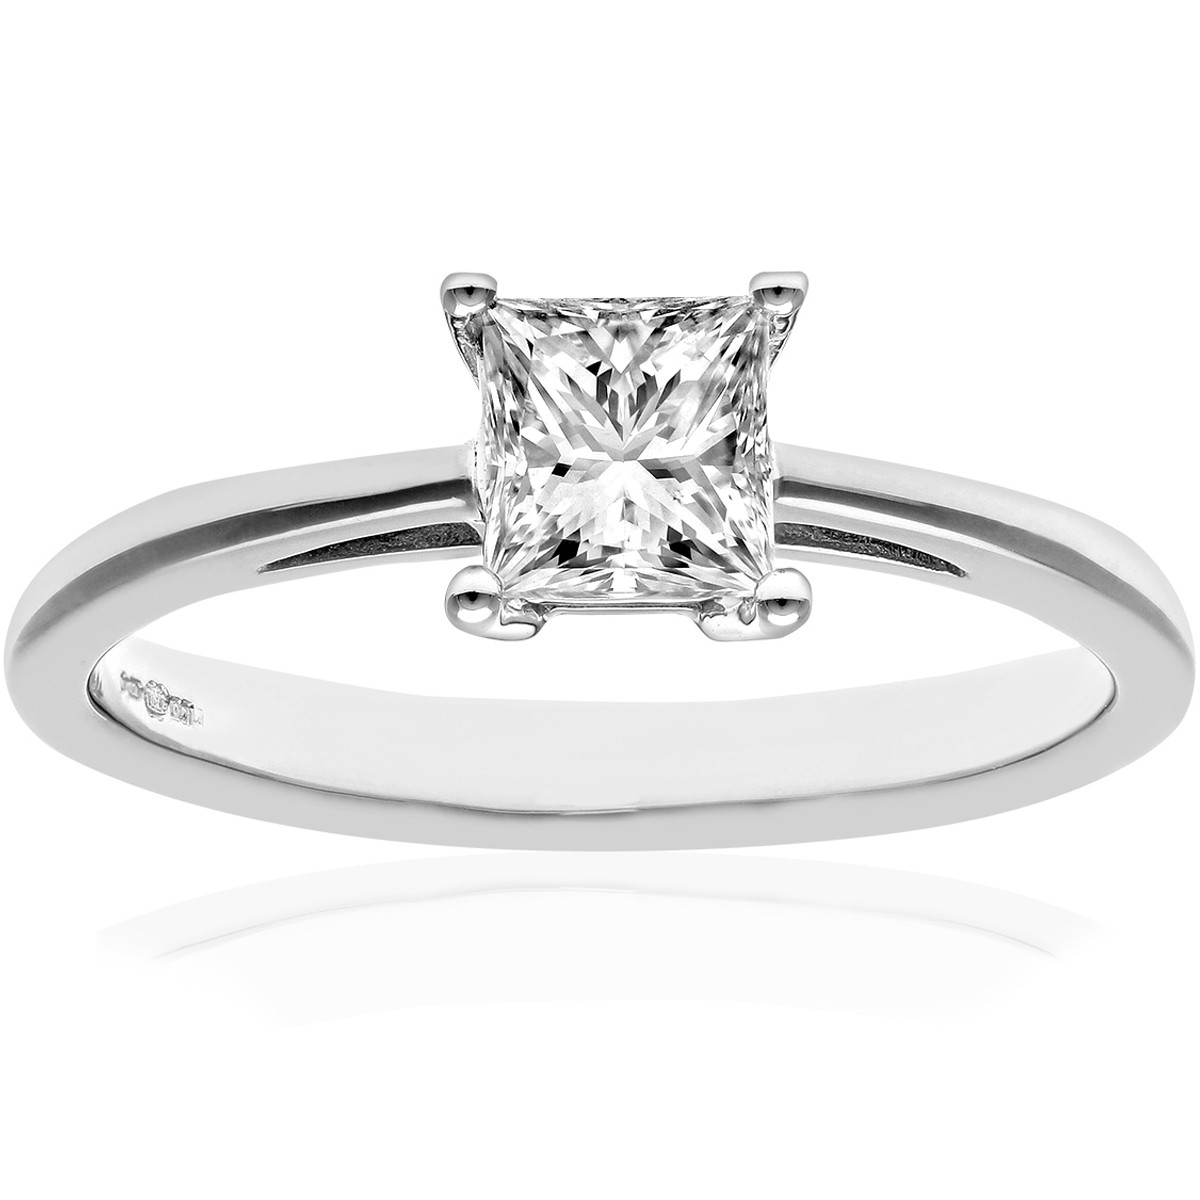 18CT WHITE GOLD 0.75CT DIAMOND PRINCESS CUT RING